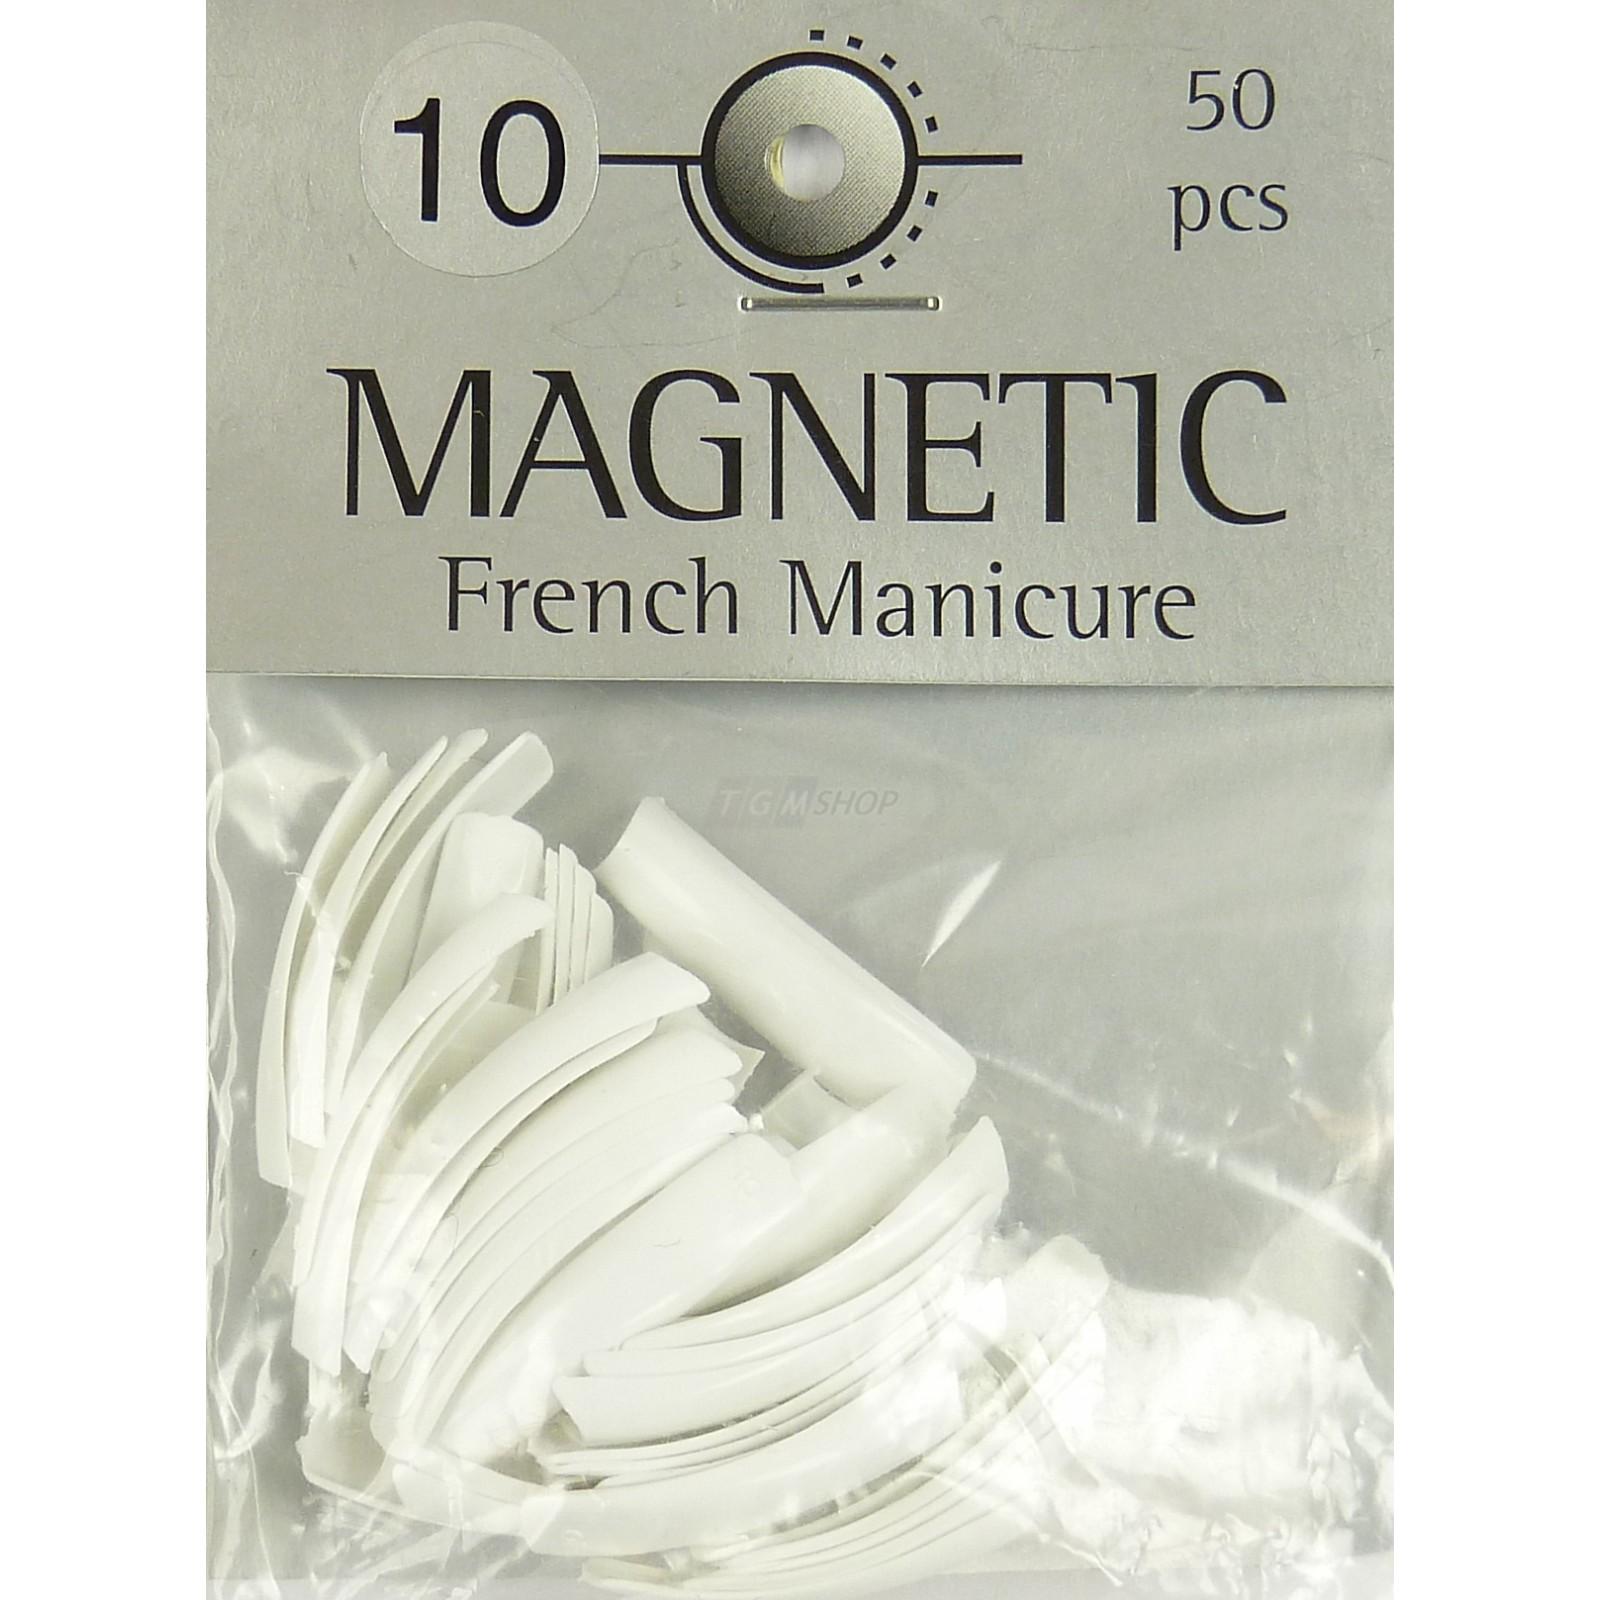 Magnetic - Nail Tips -French Manicure Grösse 10 - Kunstfingernägel - 50 Stück